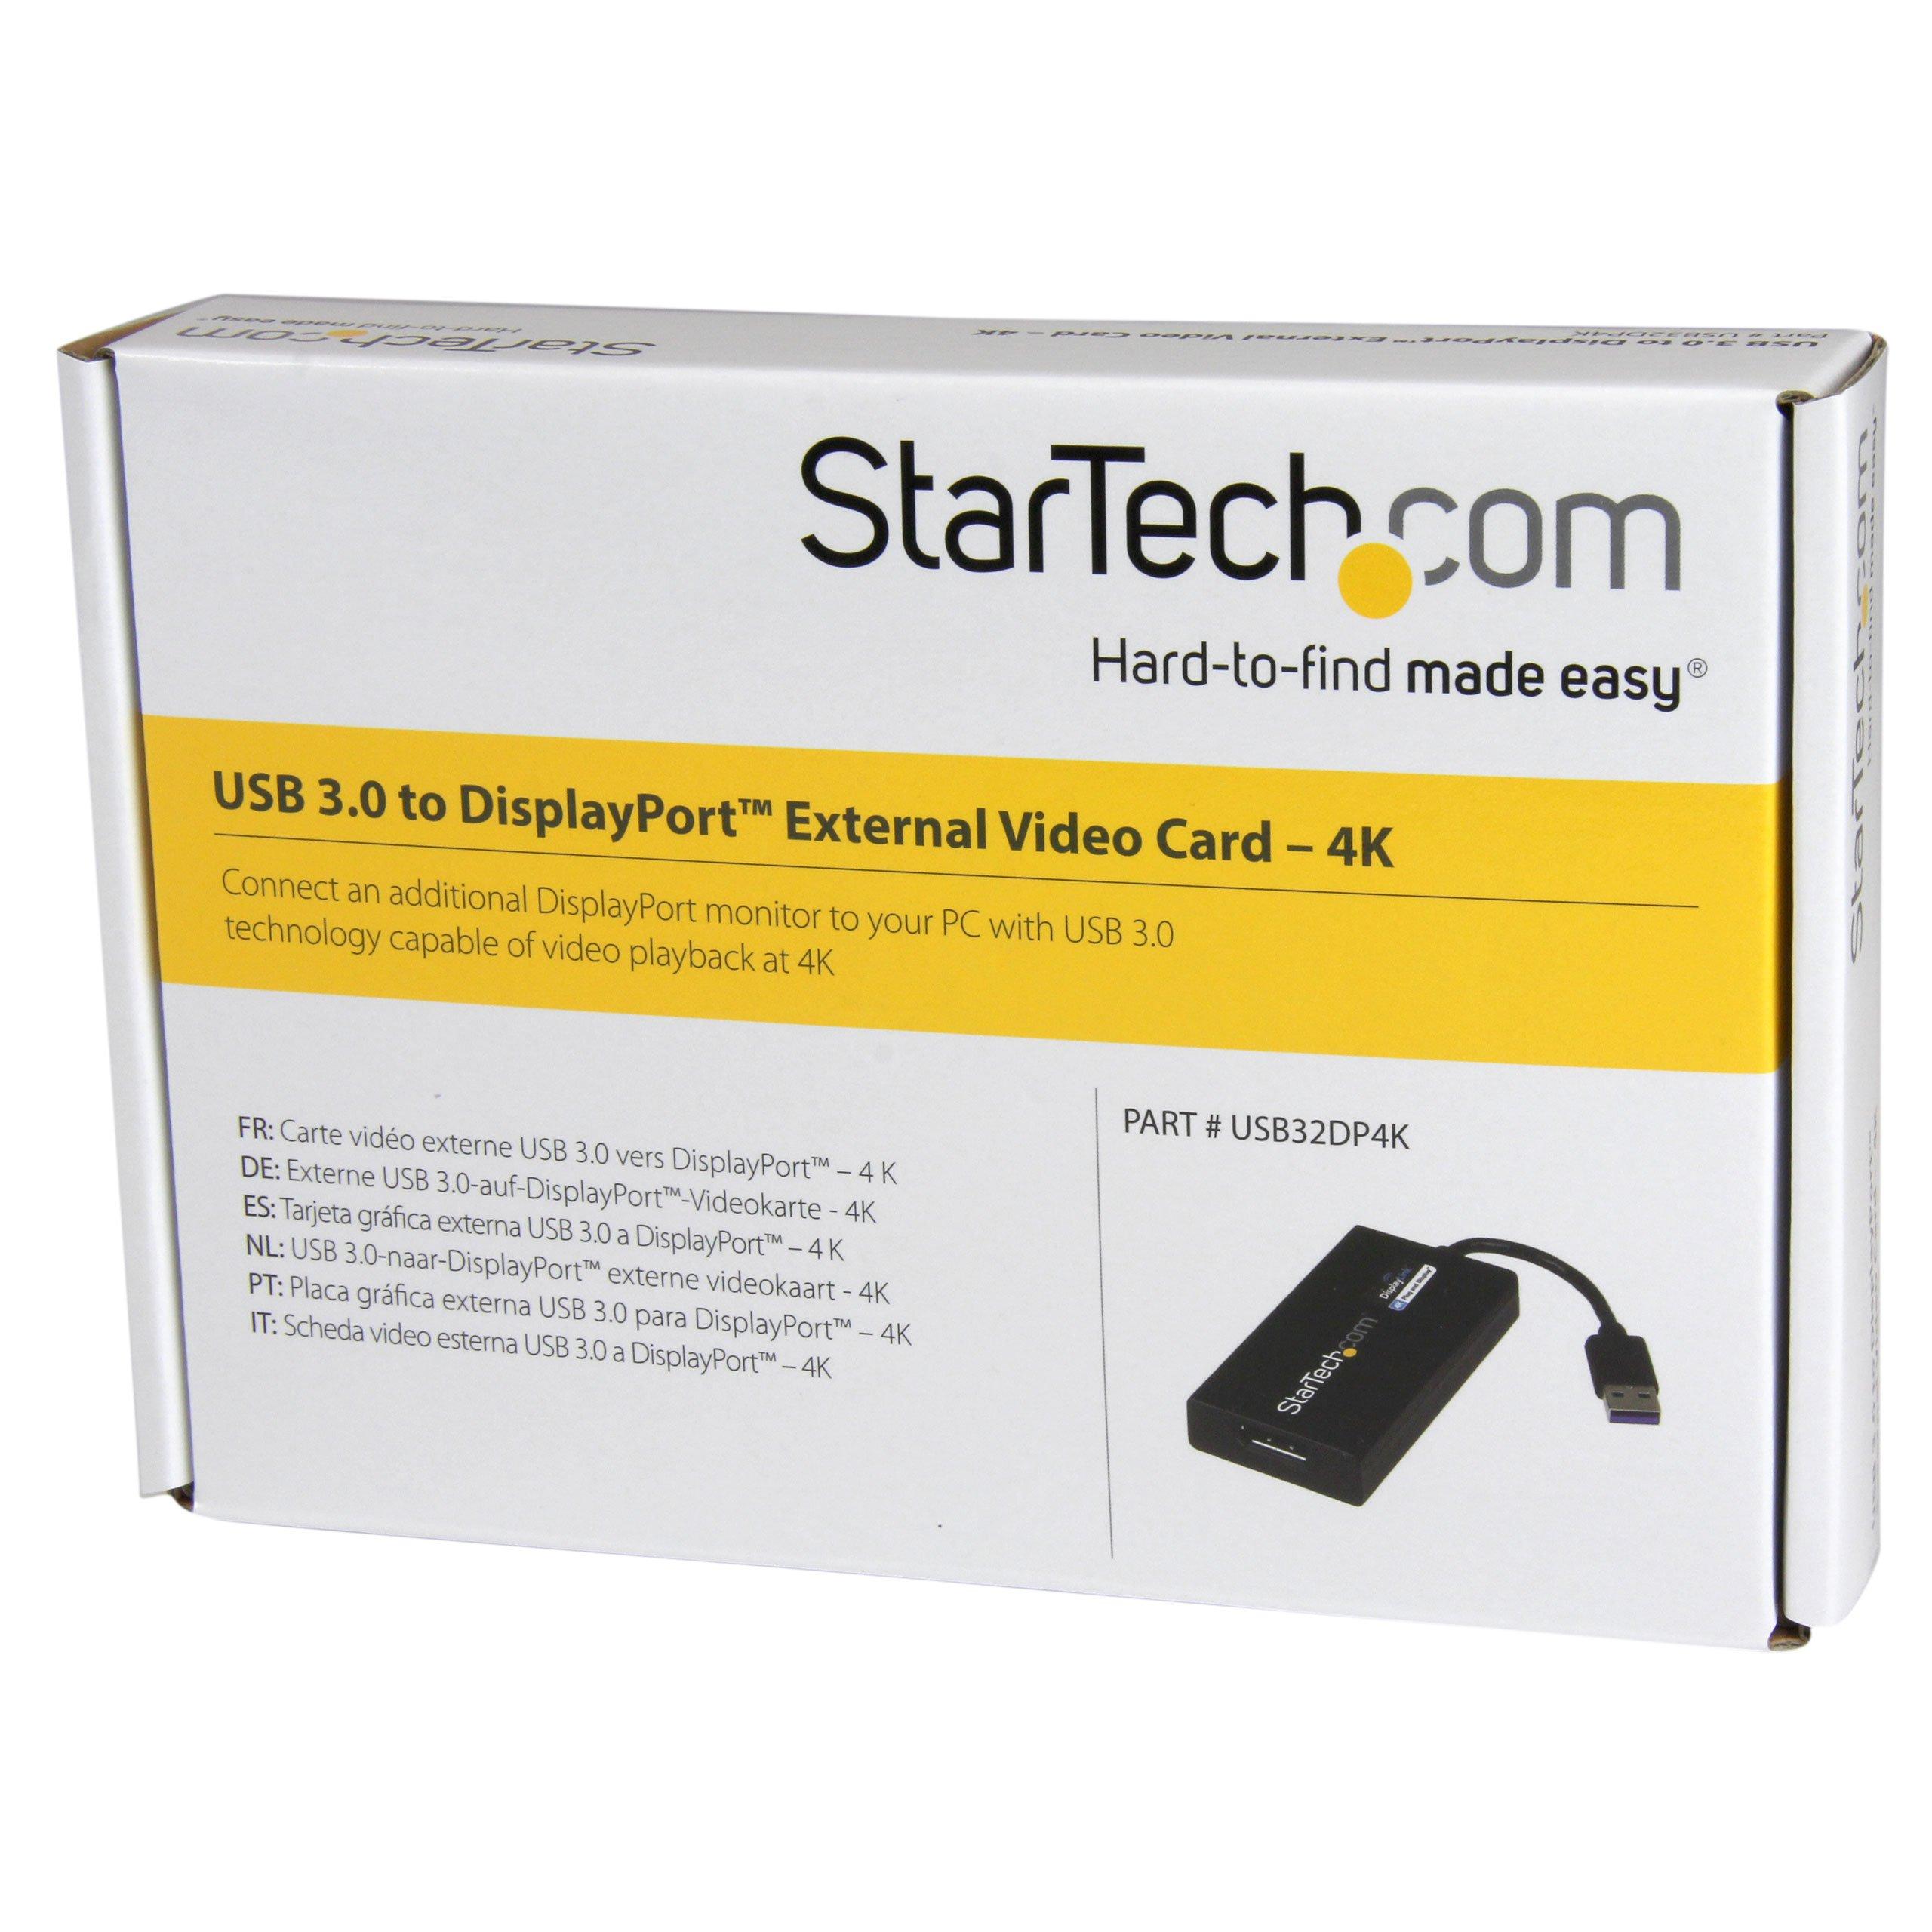 USB 3.0 to 4K DisplayPort External Multi Monitor Graphics Adapter - DisplayLink Certified - USB 3.0 Video Card - Ultra HD 4K